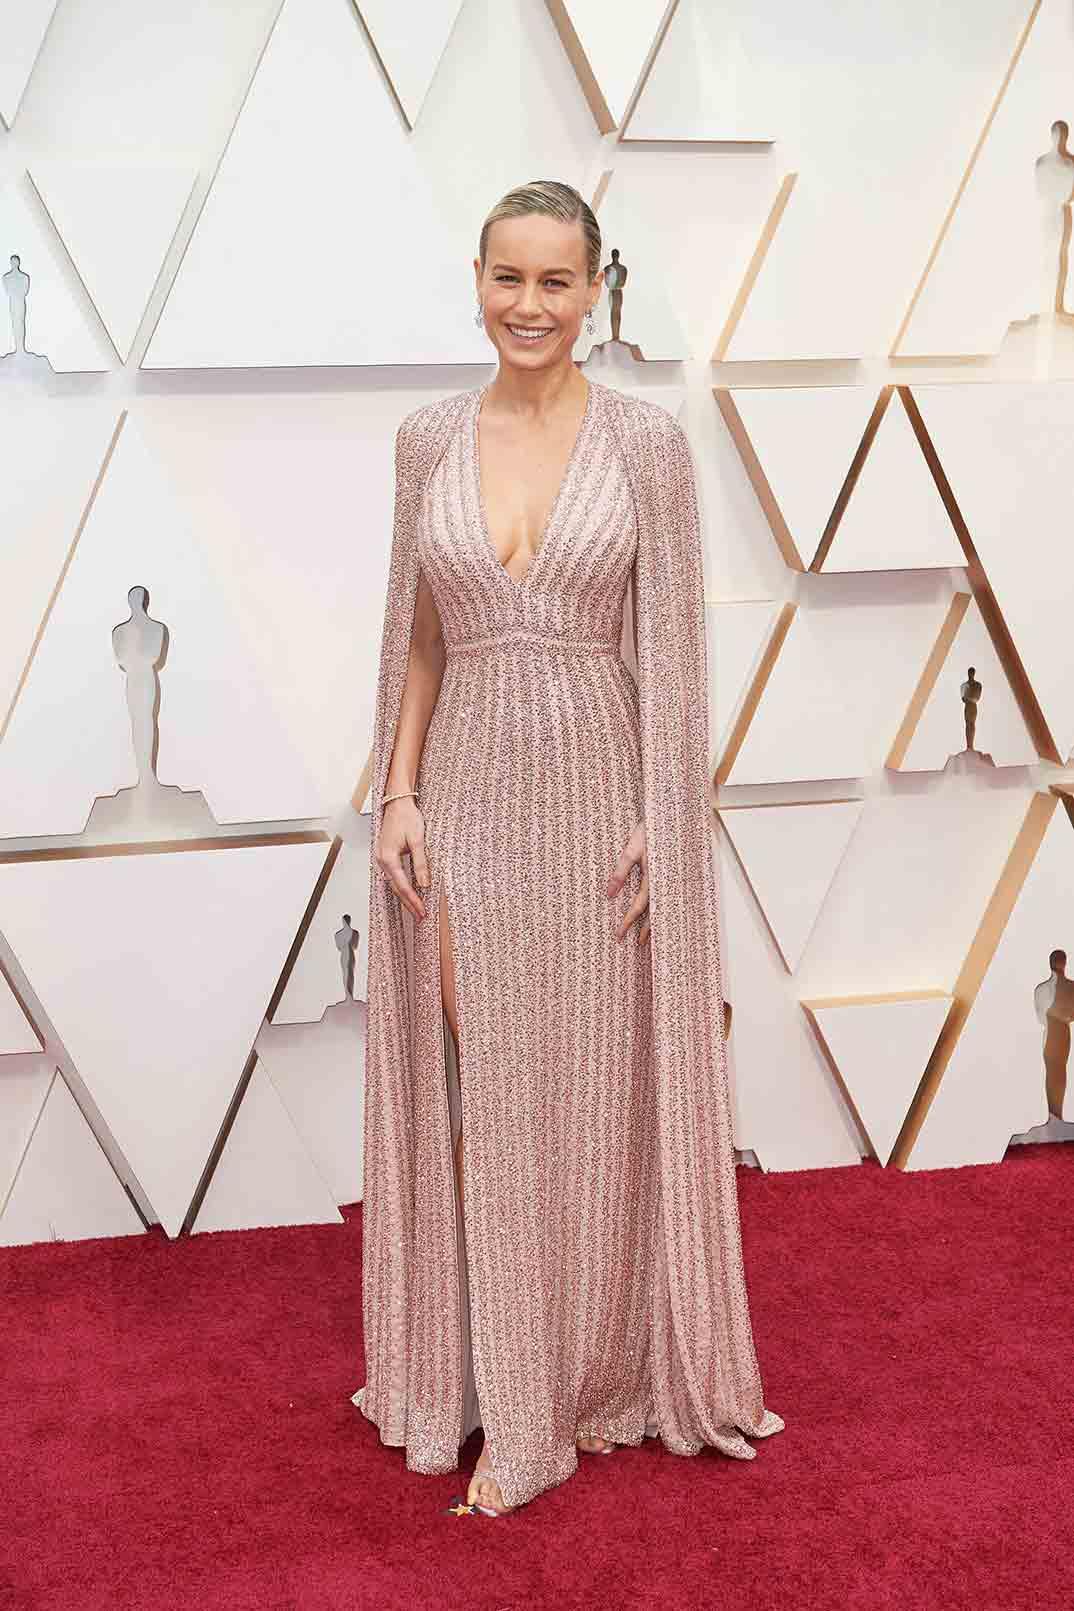 Brie Larson - Oscars 2020 © A.M.P.A.S.